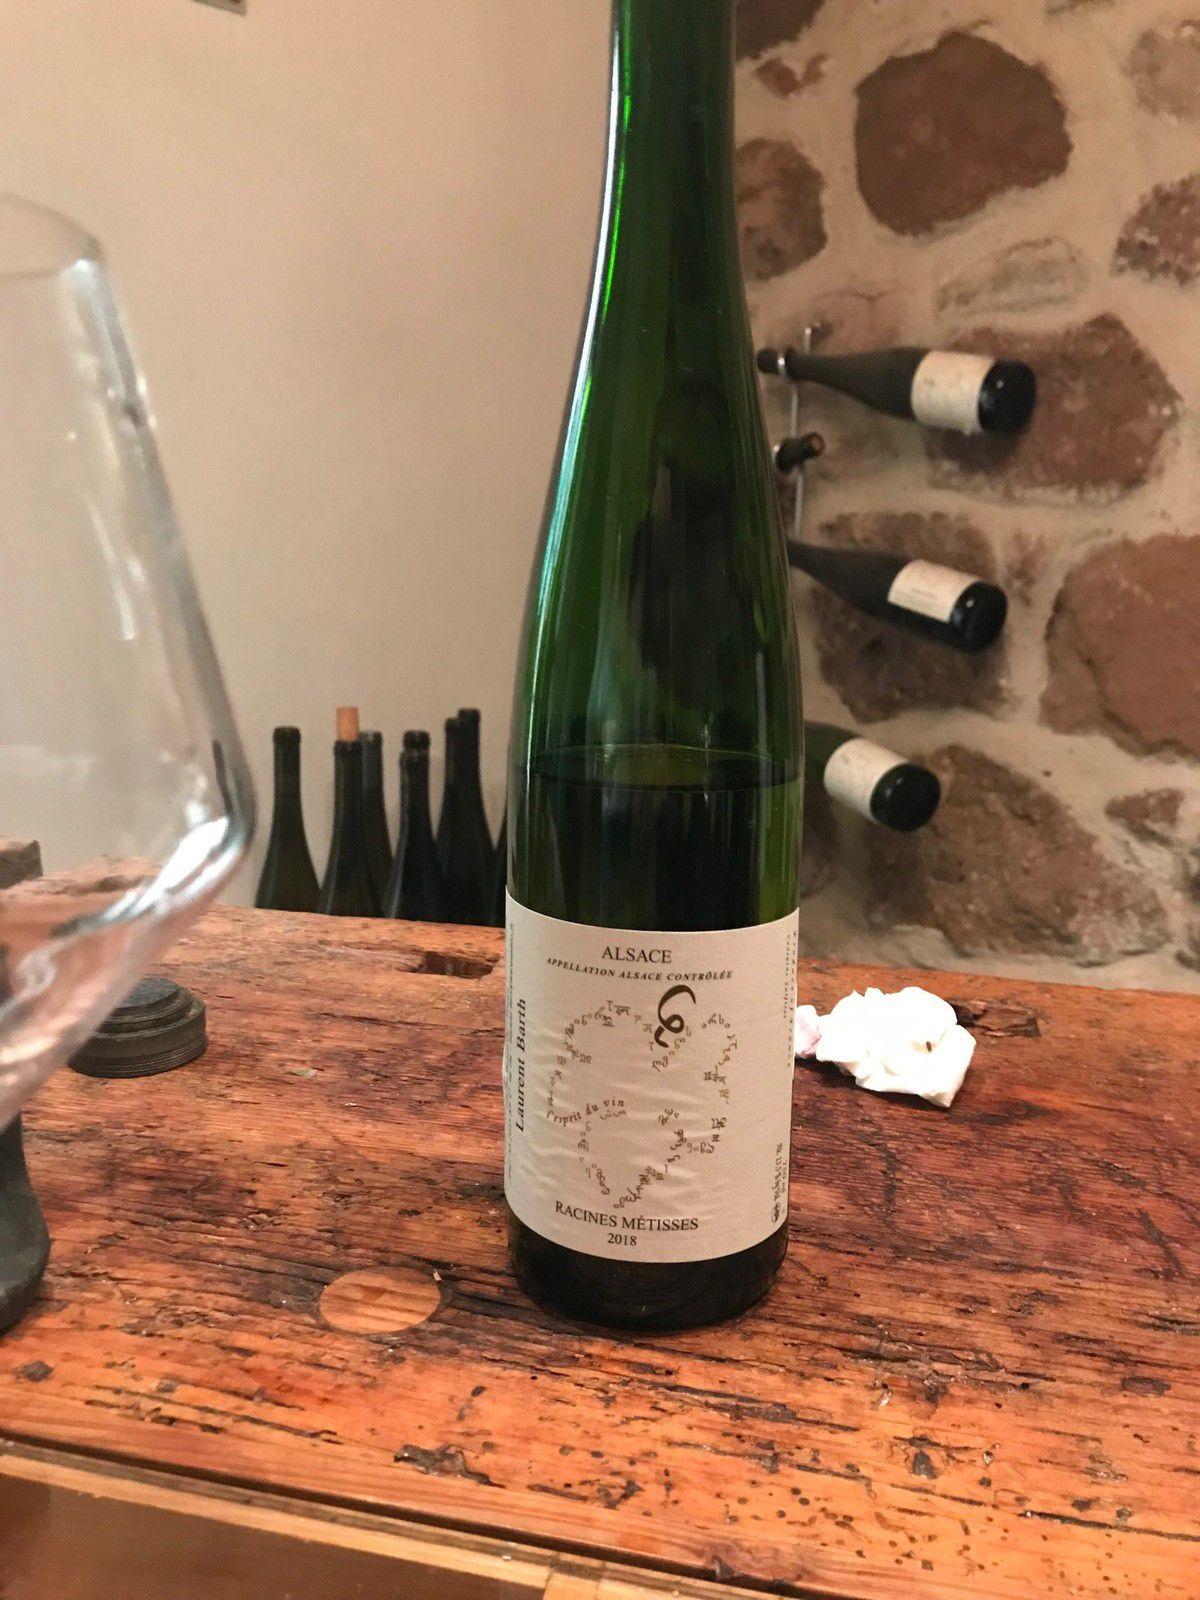 Vins, Laurent Barth, Alsace, Racines Métisses, Bennwhir